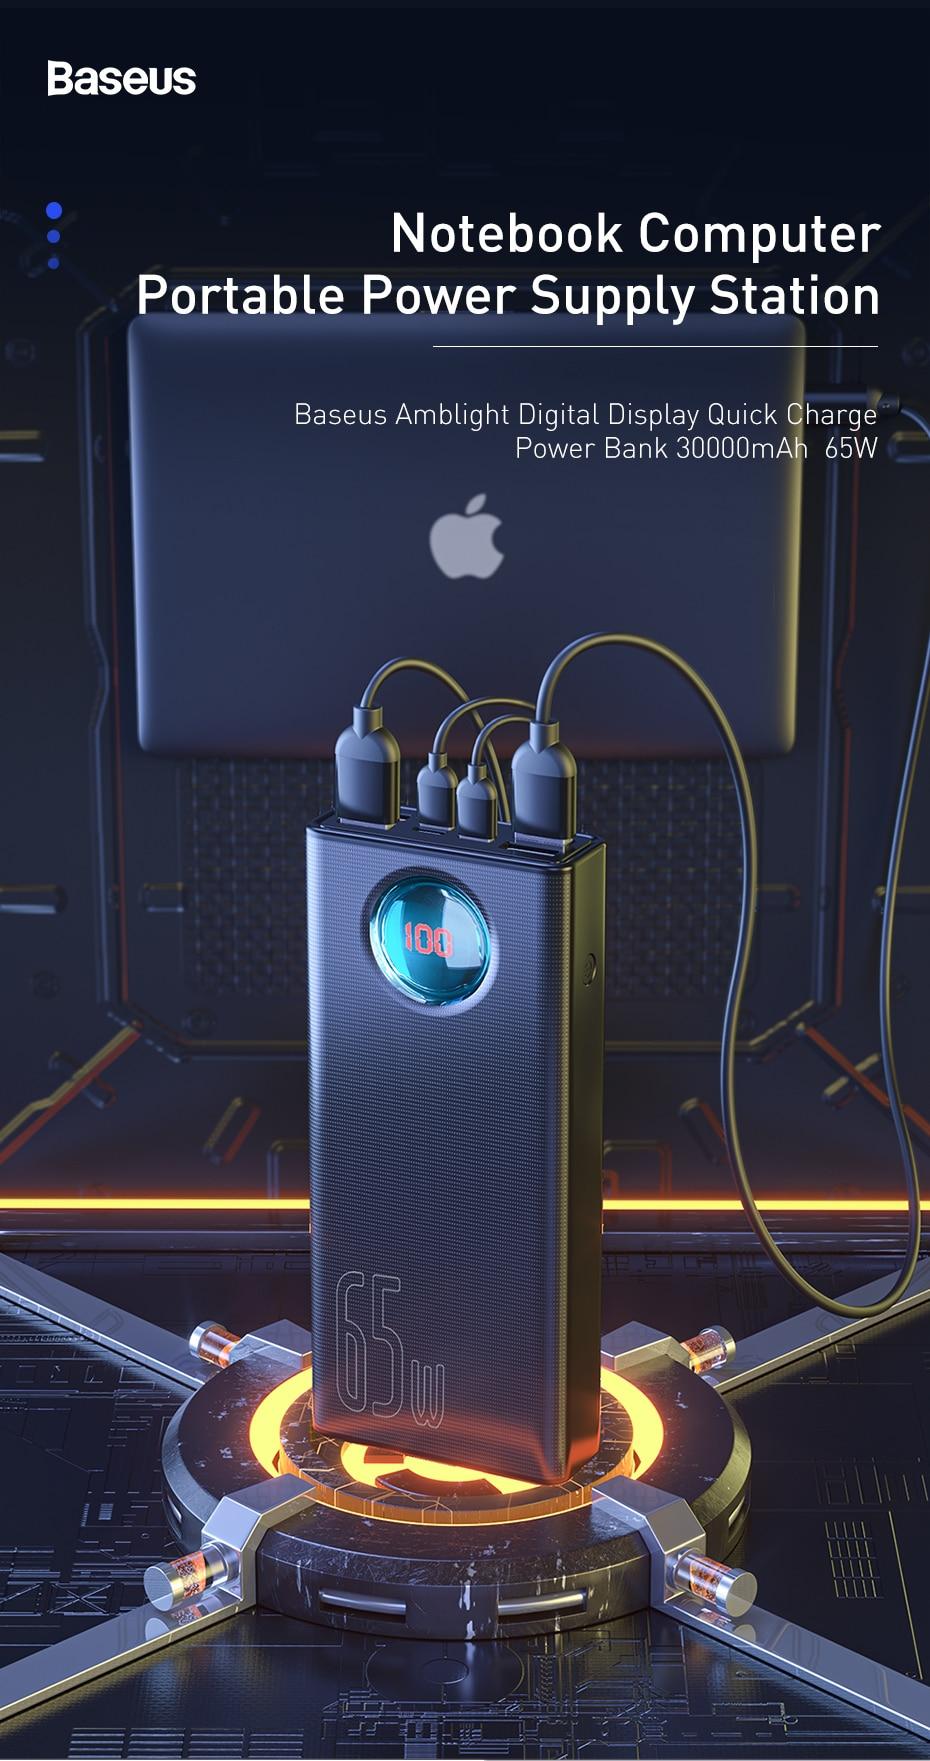 Baseus Amblight 65W Quick Charge Power Bank 30000mAh 5